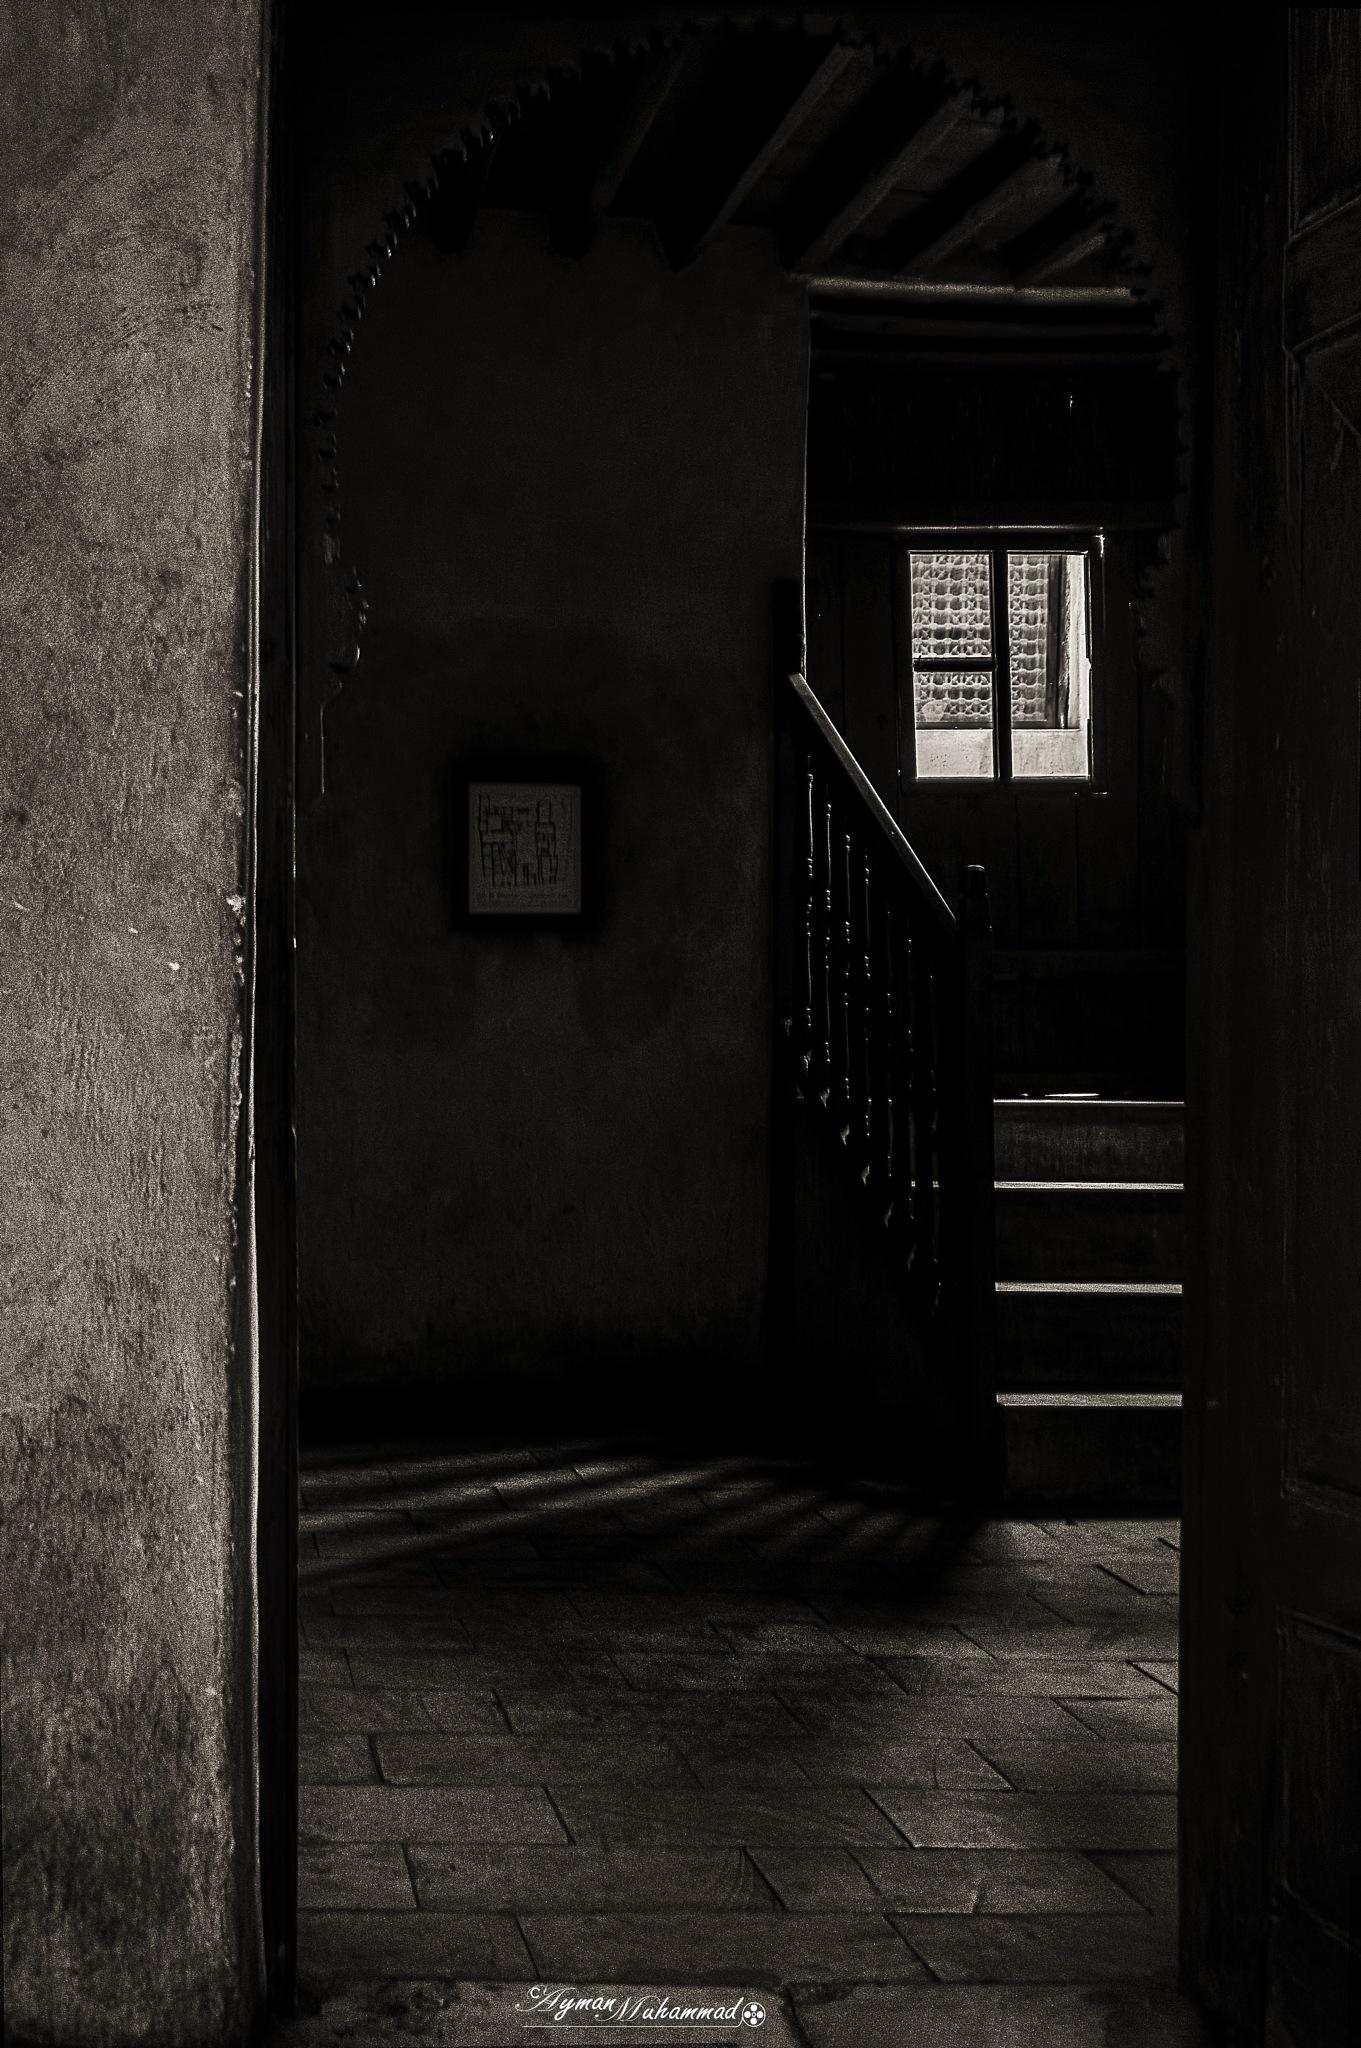 Behind the historic doors +1 by AymanMuhammad